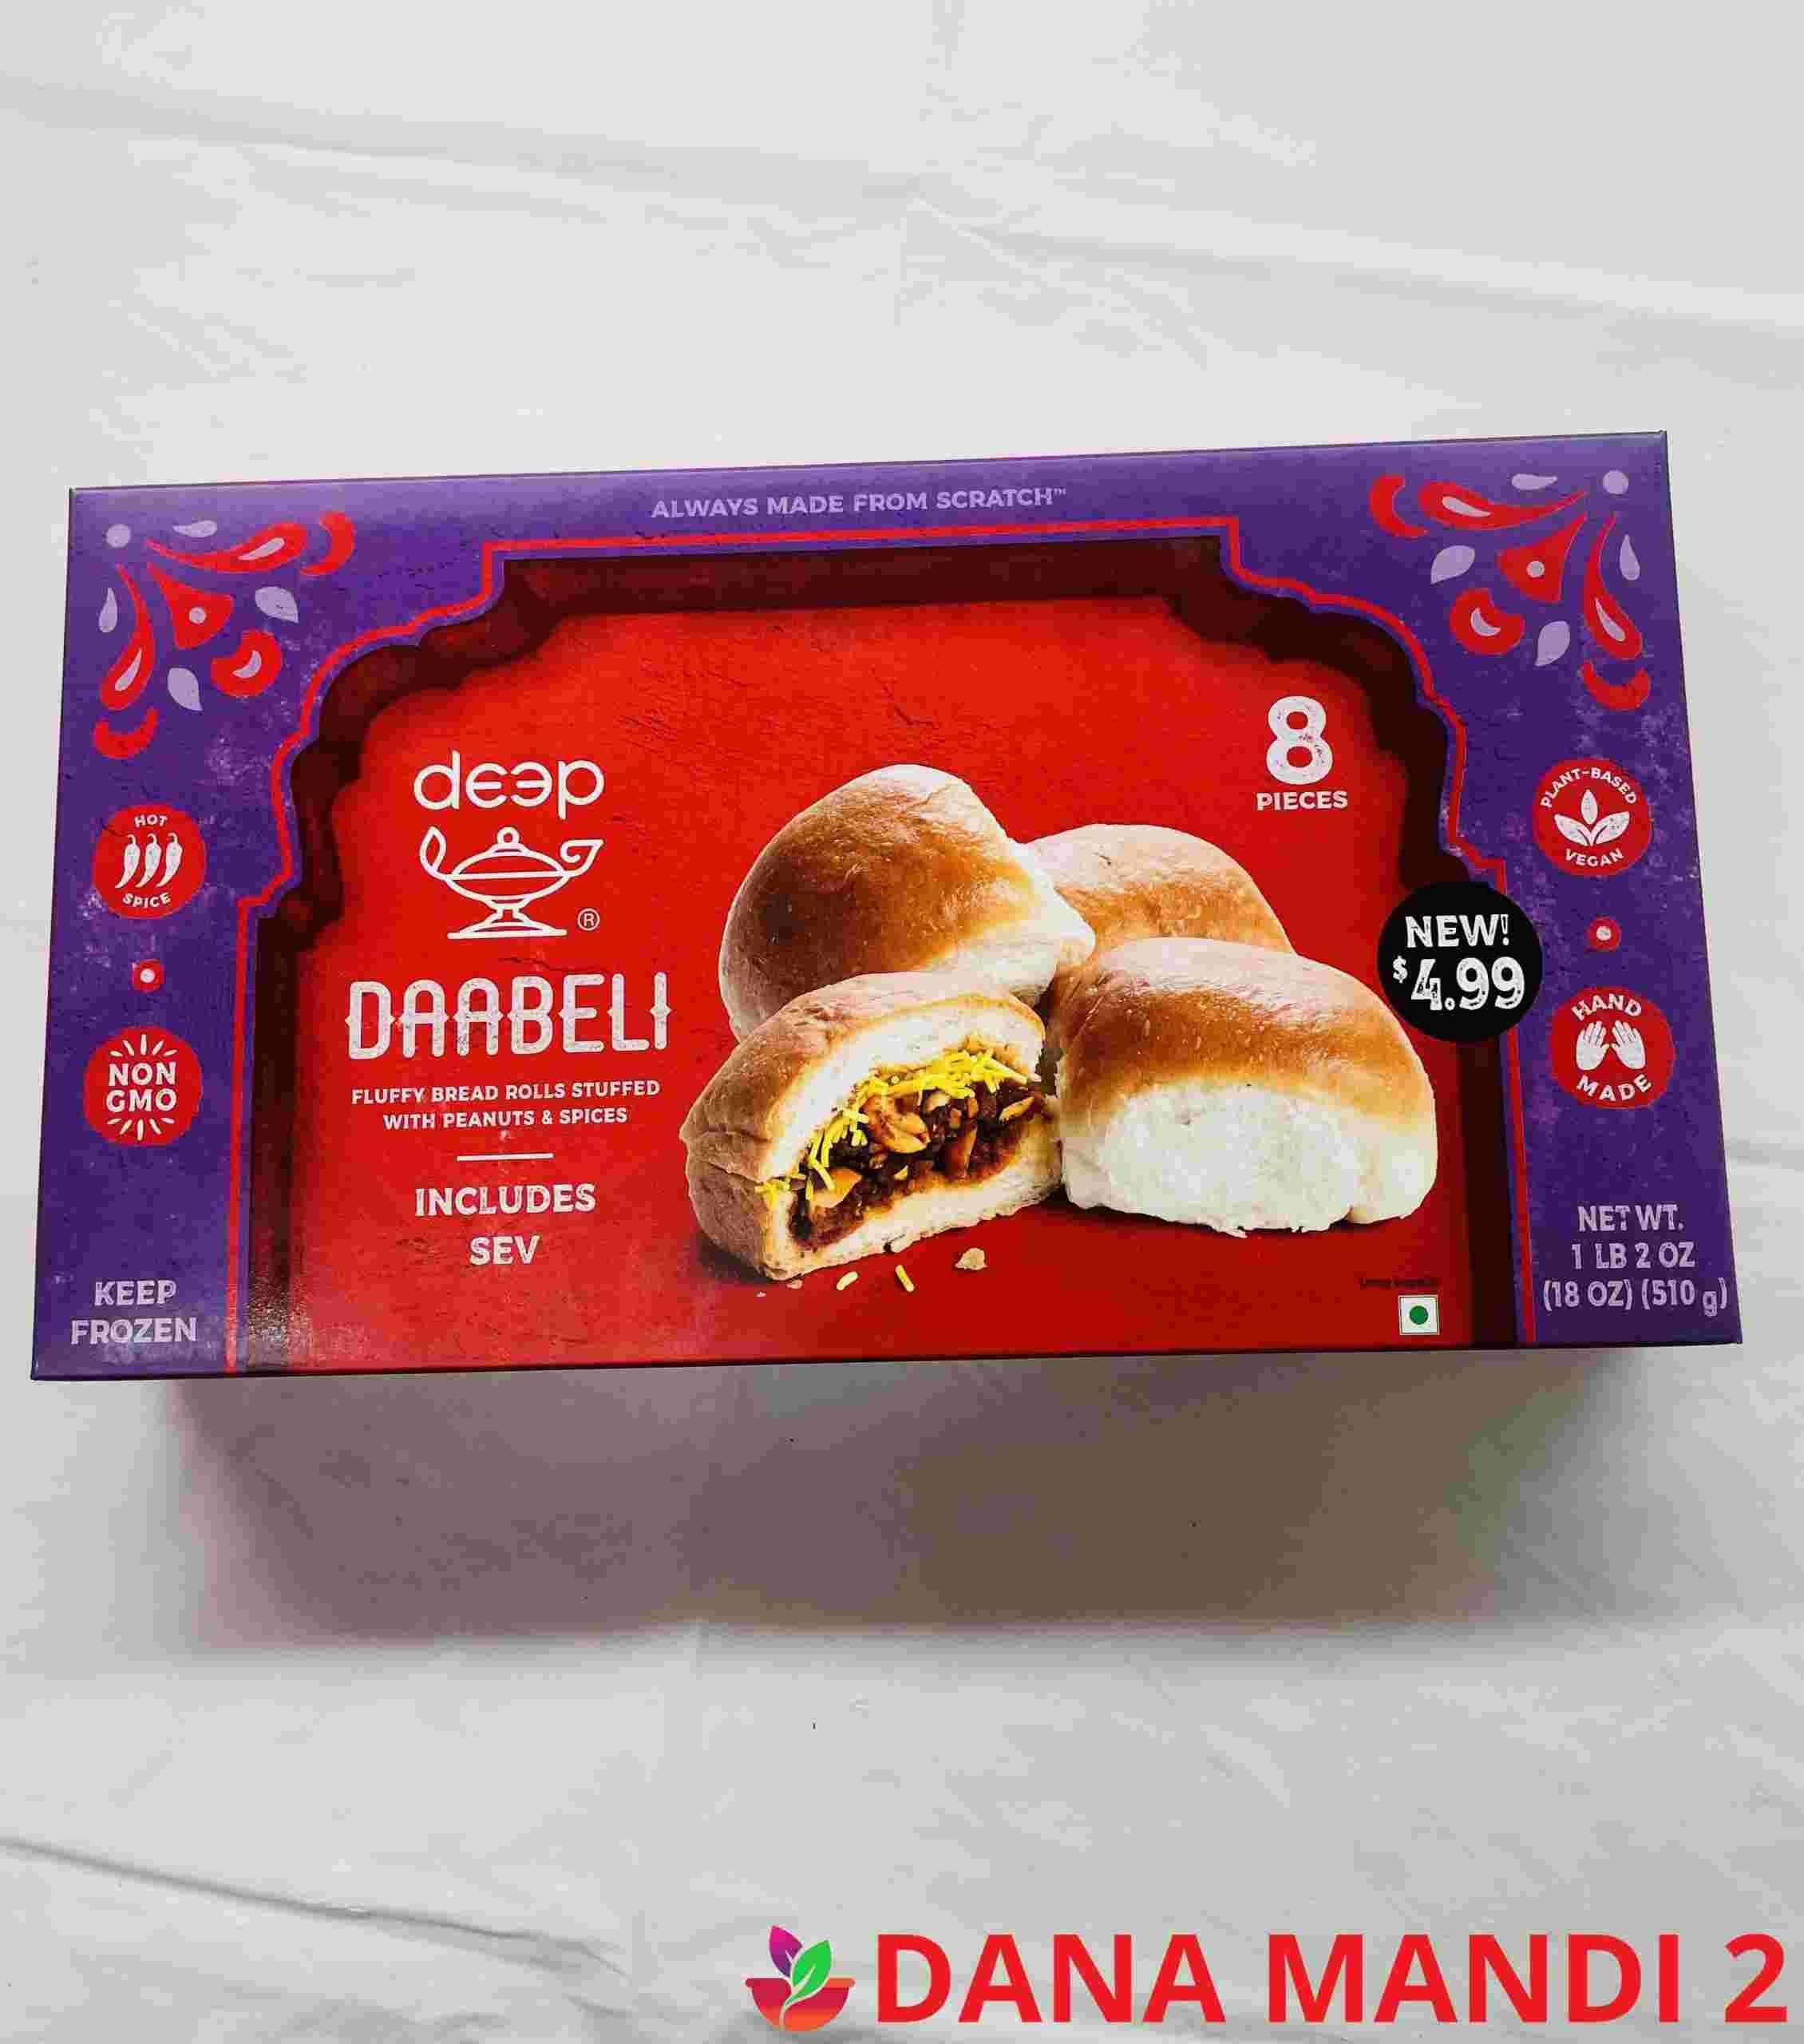 Deep  Daabeli 8 Pieces